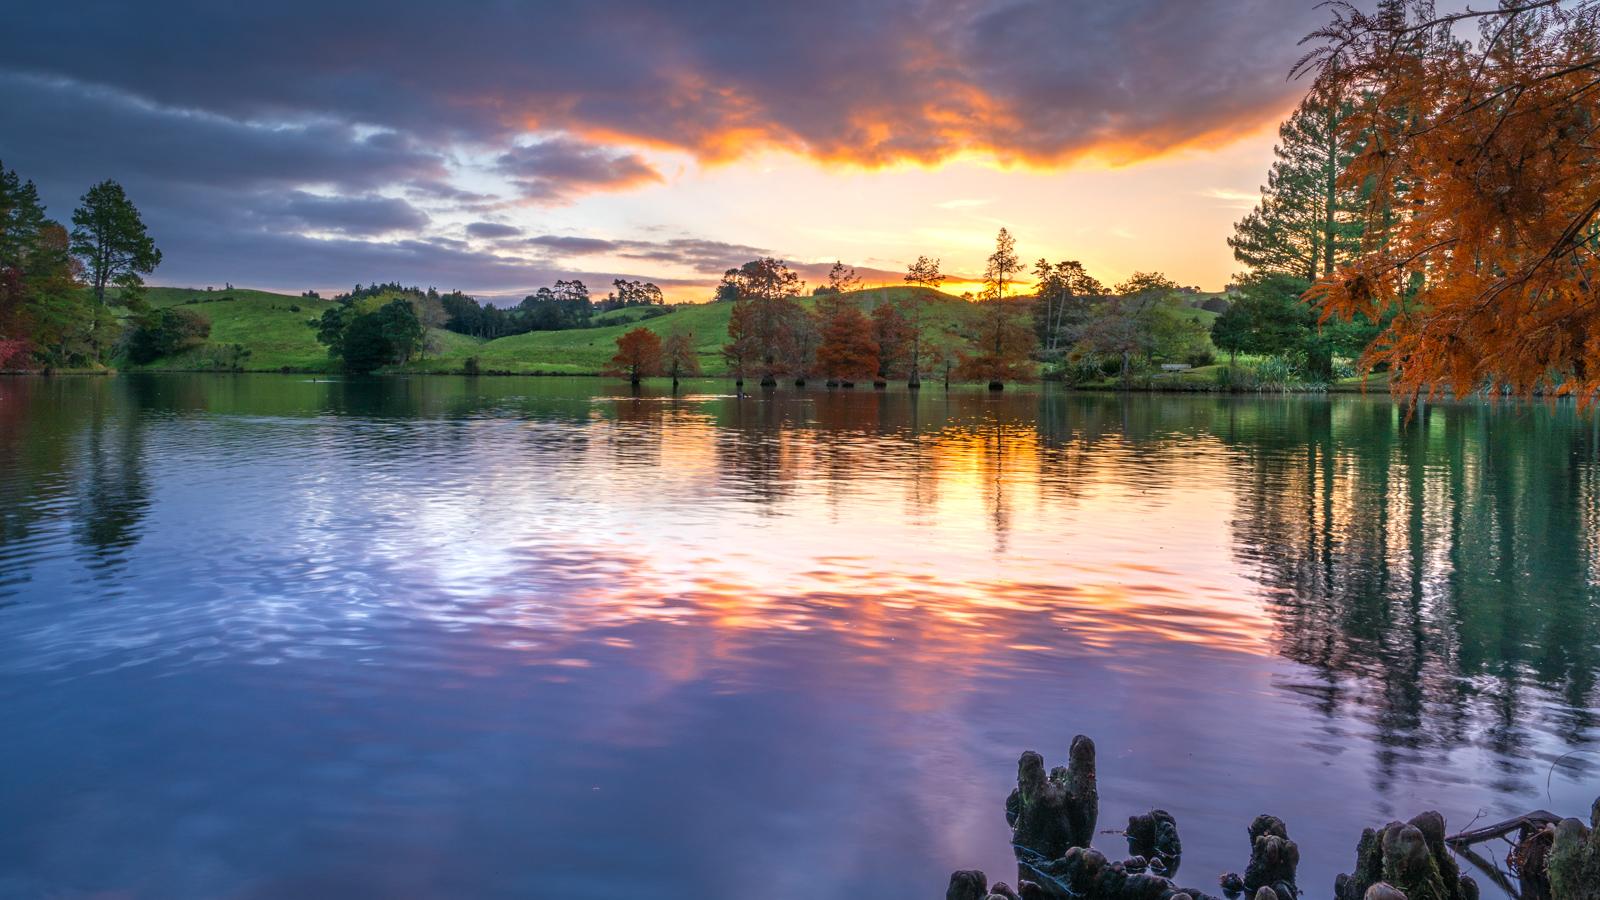 McLaren Falls Autumn Sunset Photography Workshop